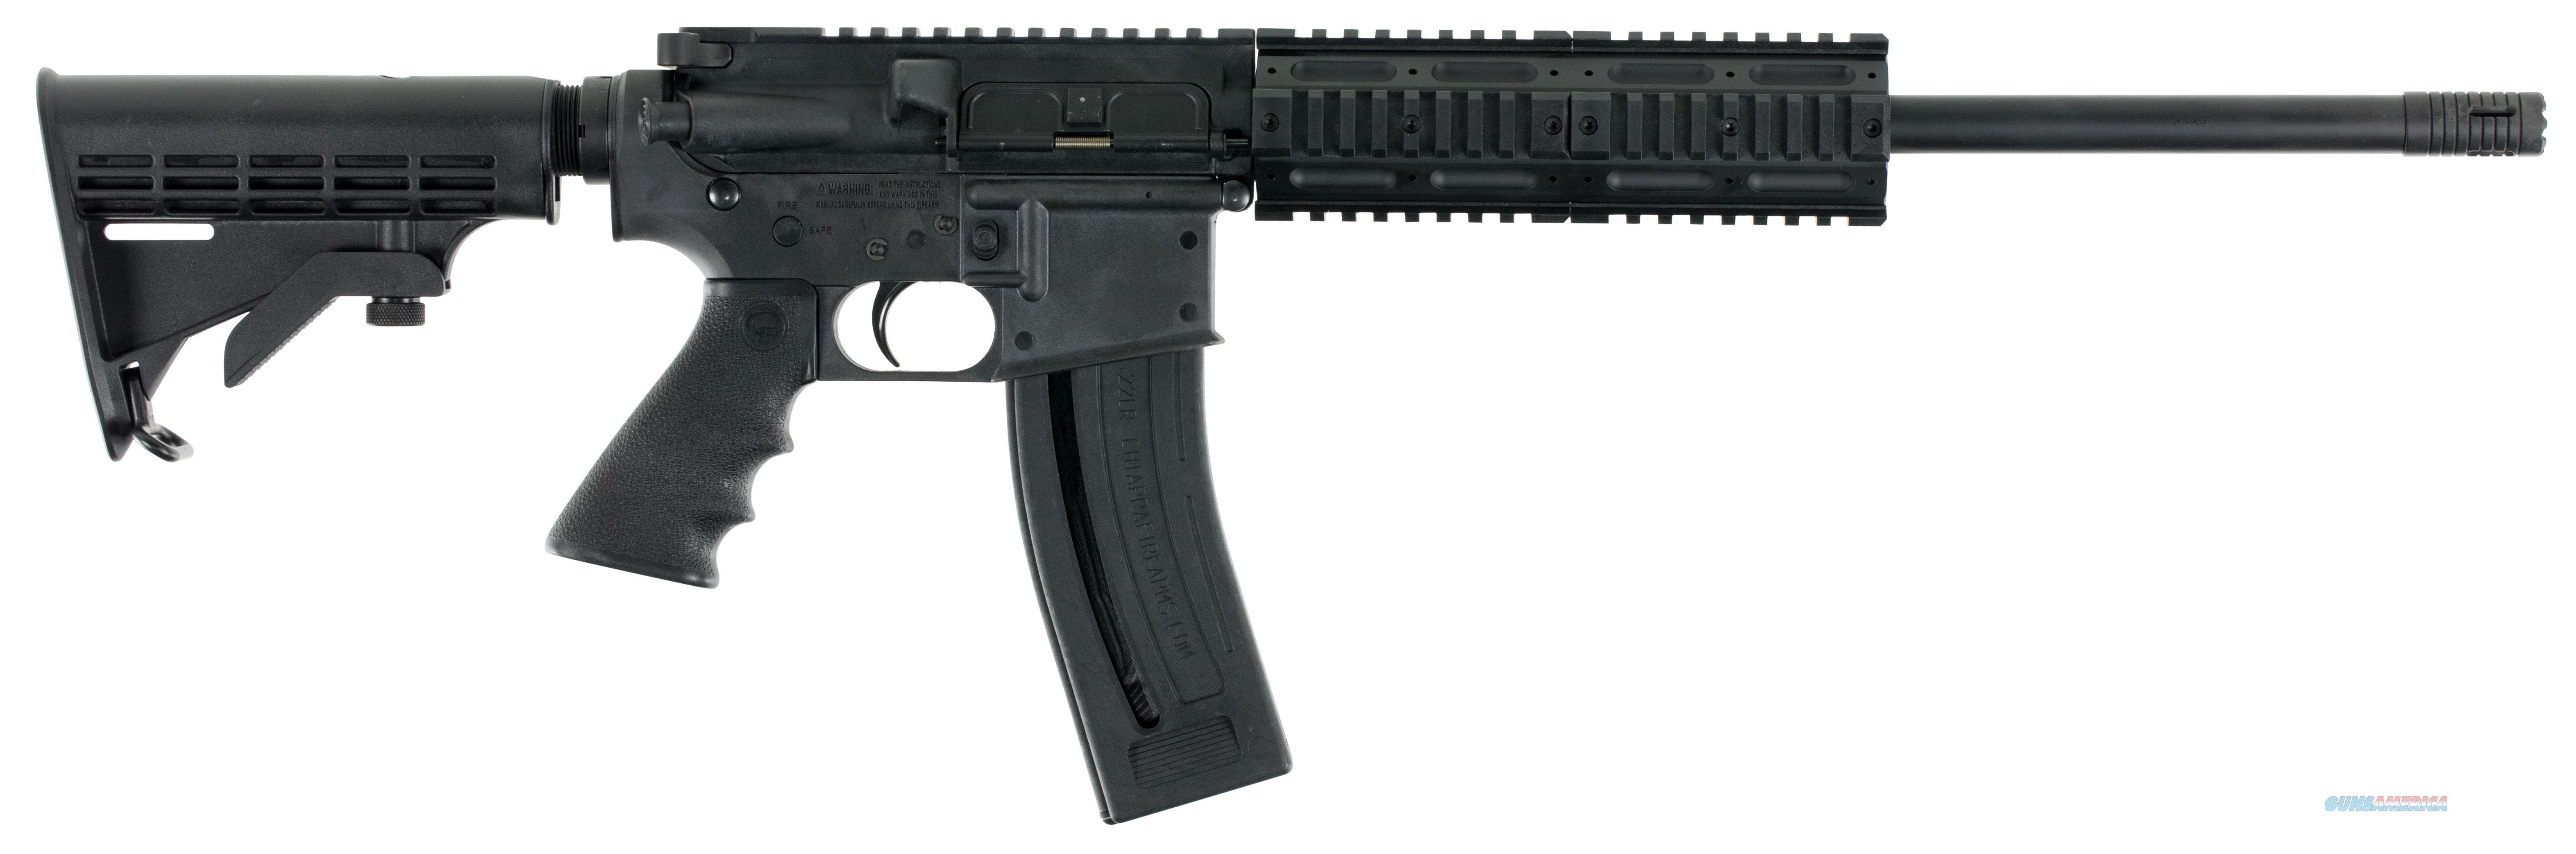 "Chiappa Firearms Cf500.090 M4-22 Gen-Ii Pro Carbine 22 Lr 18.5"" 28+1 6Pos Stk Blk CF500.090  Guns > Rifles > C Misc Rifles"